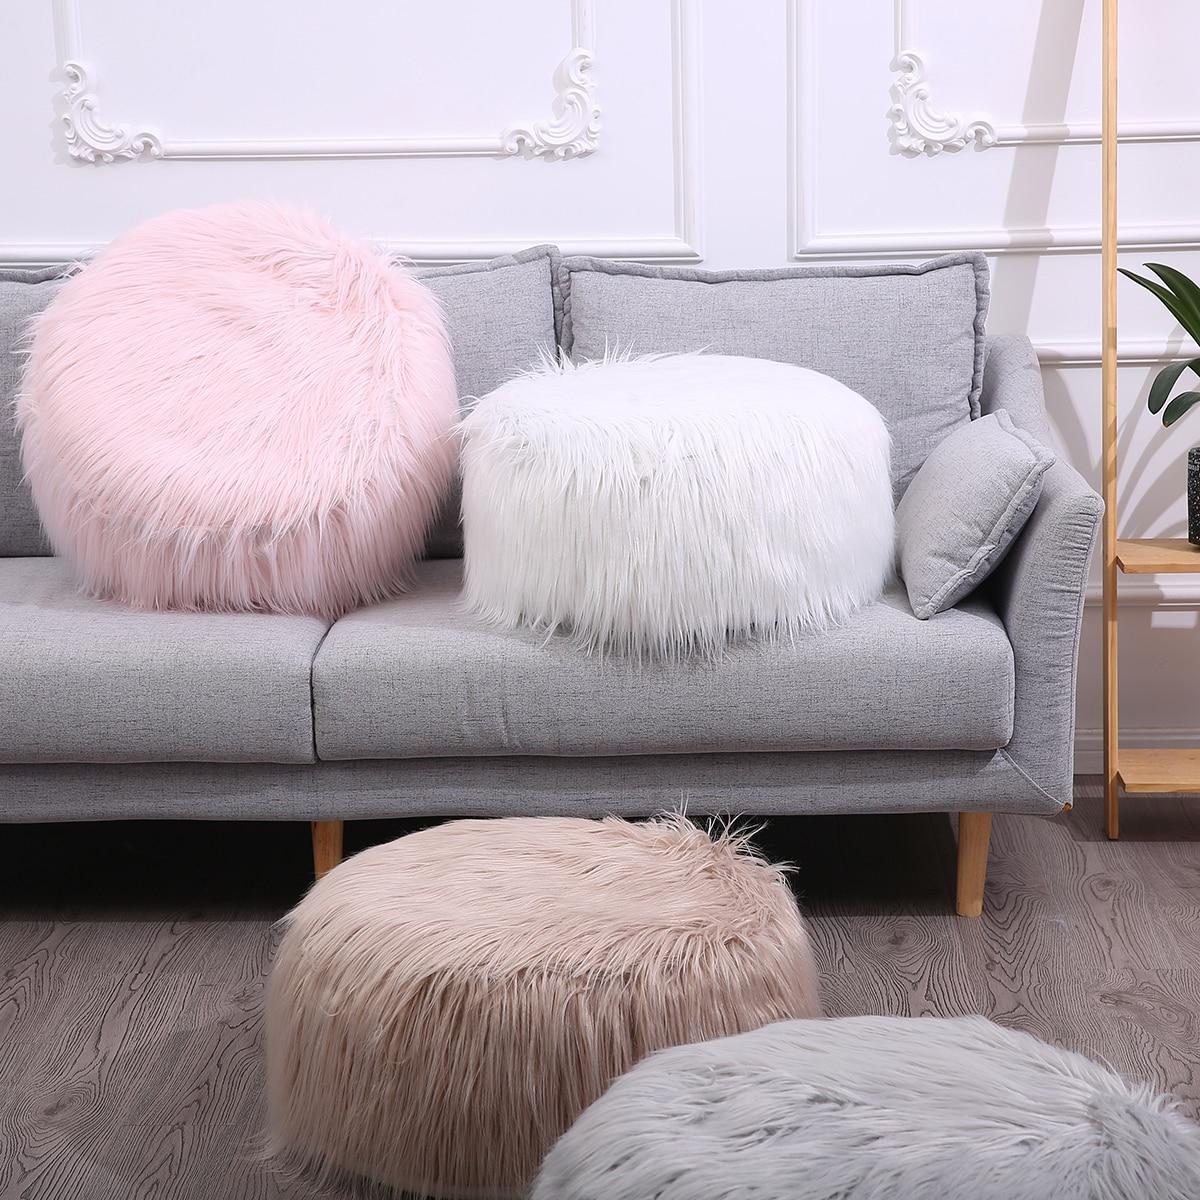 Faux Sheepskin Bean Bag Chair Soft Fur Beanbag Fluffy Small Round Lazy BeanBag Sofa Portable  Inflatable Christmas Decor D20